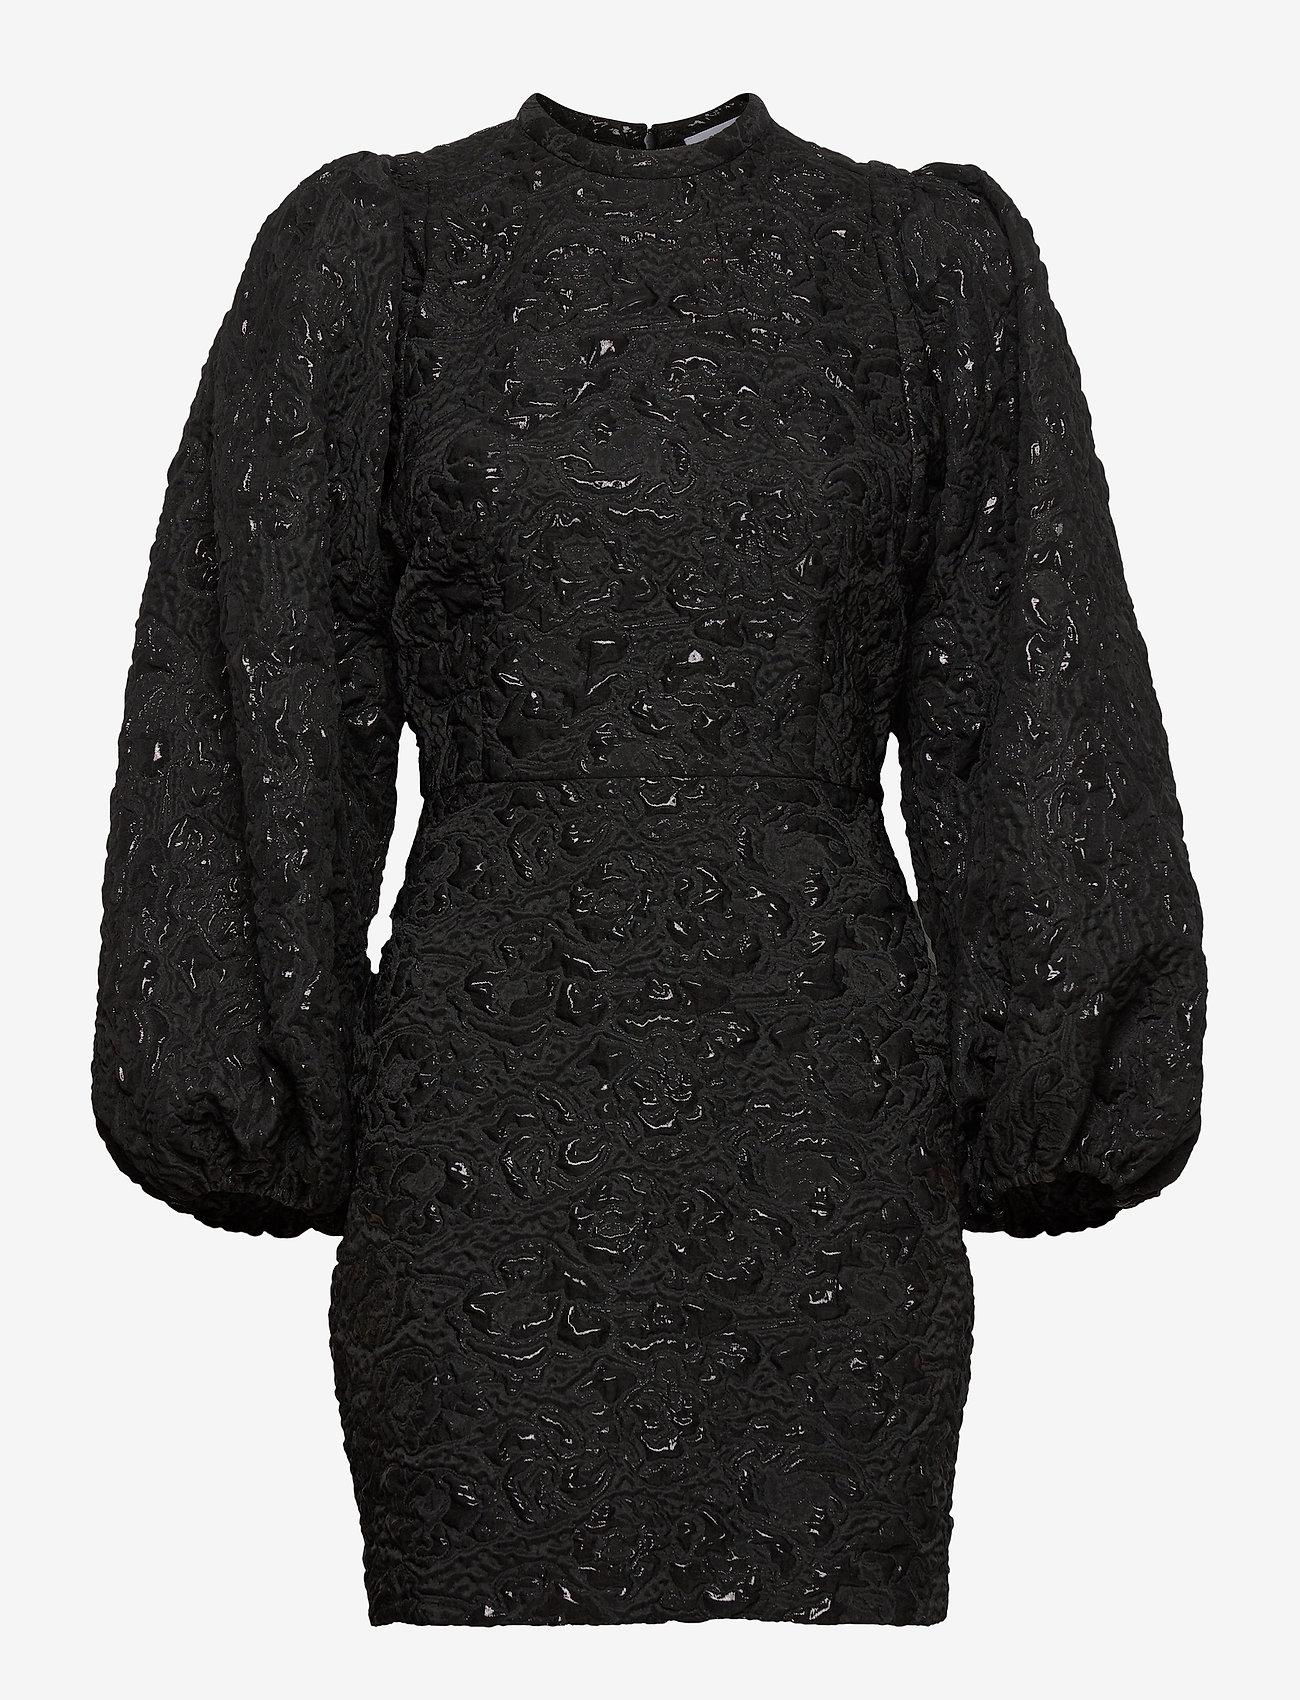 Samsøe Samsøe - Harriet short dress 12905 - cocktailkjoler - black - 1